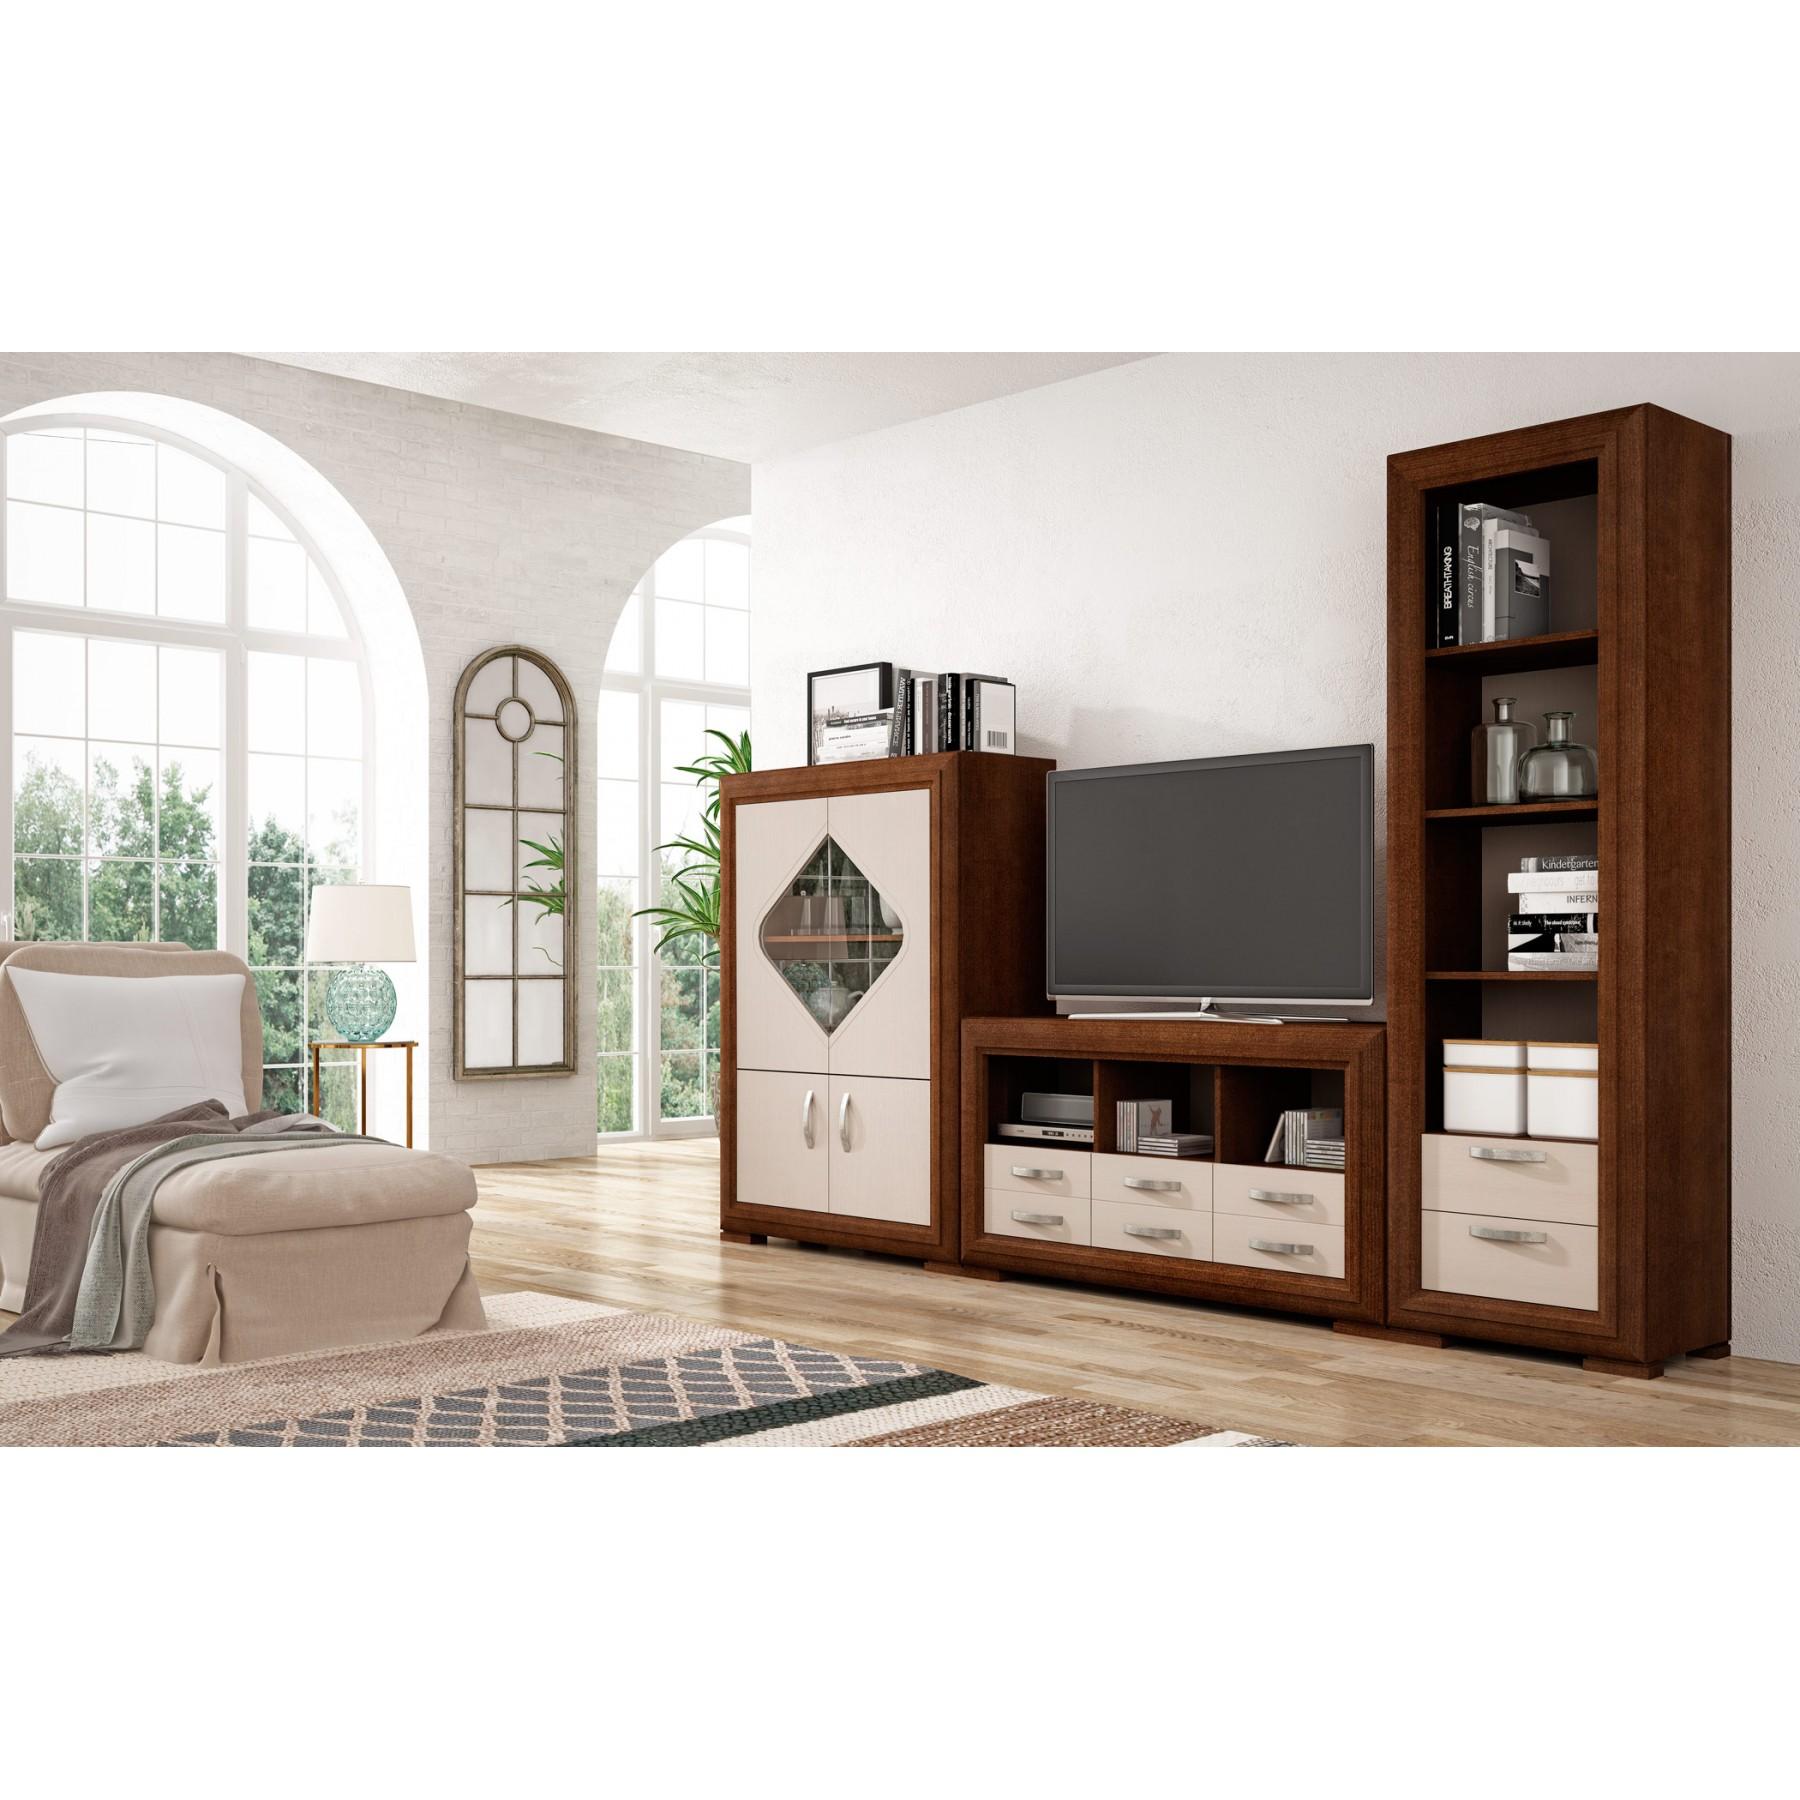 Muebles De Sal N Modelo Hispania # Muebles Hispania